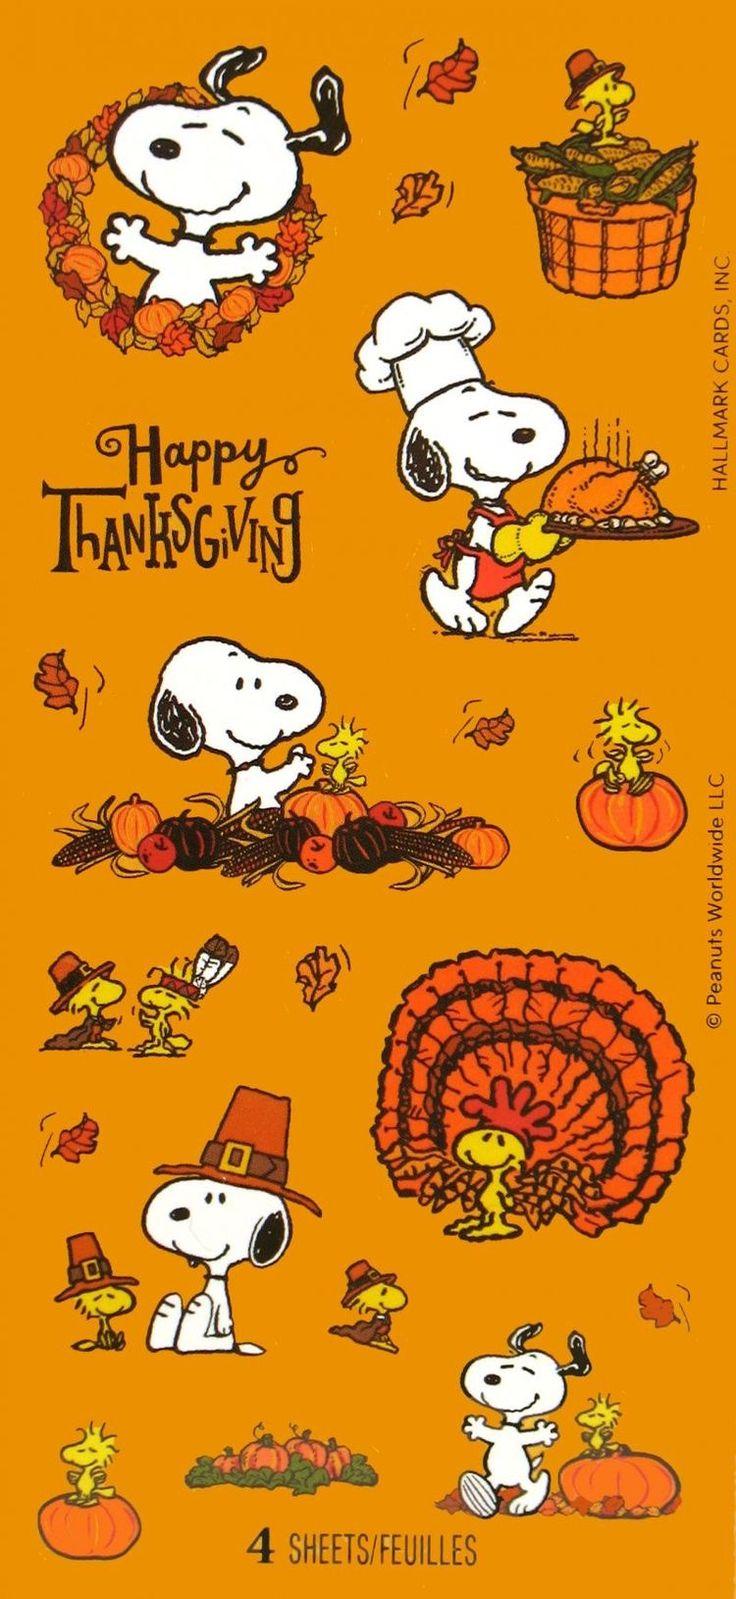 The 25 best thanksgiving wallpaper ideas on pinterest - Snoopy thanksgiving wallpaper ...